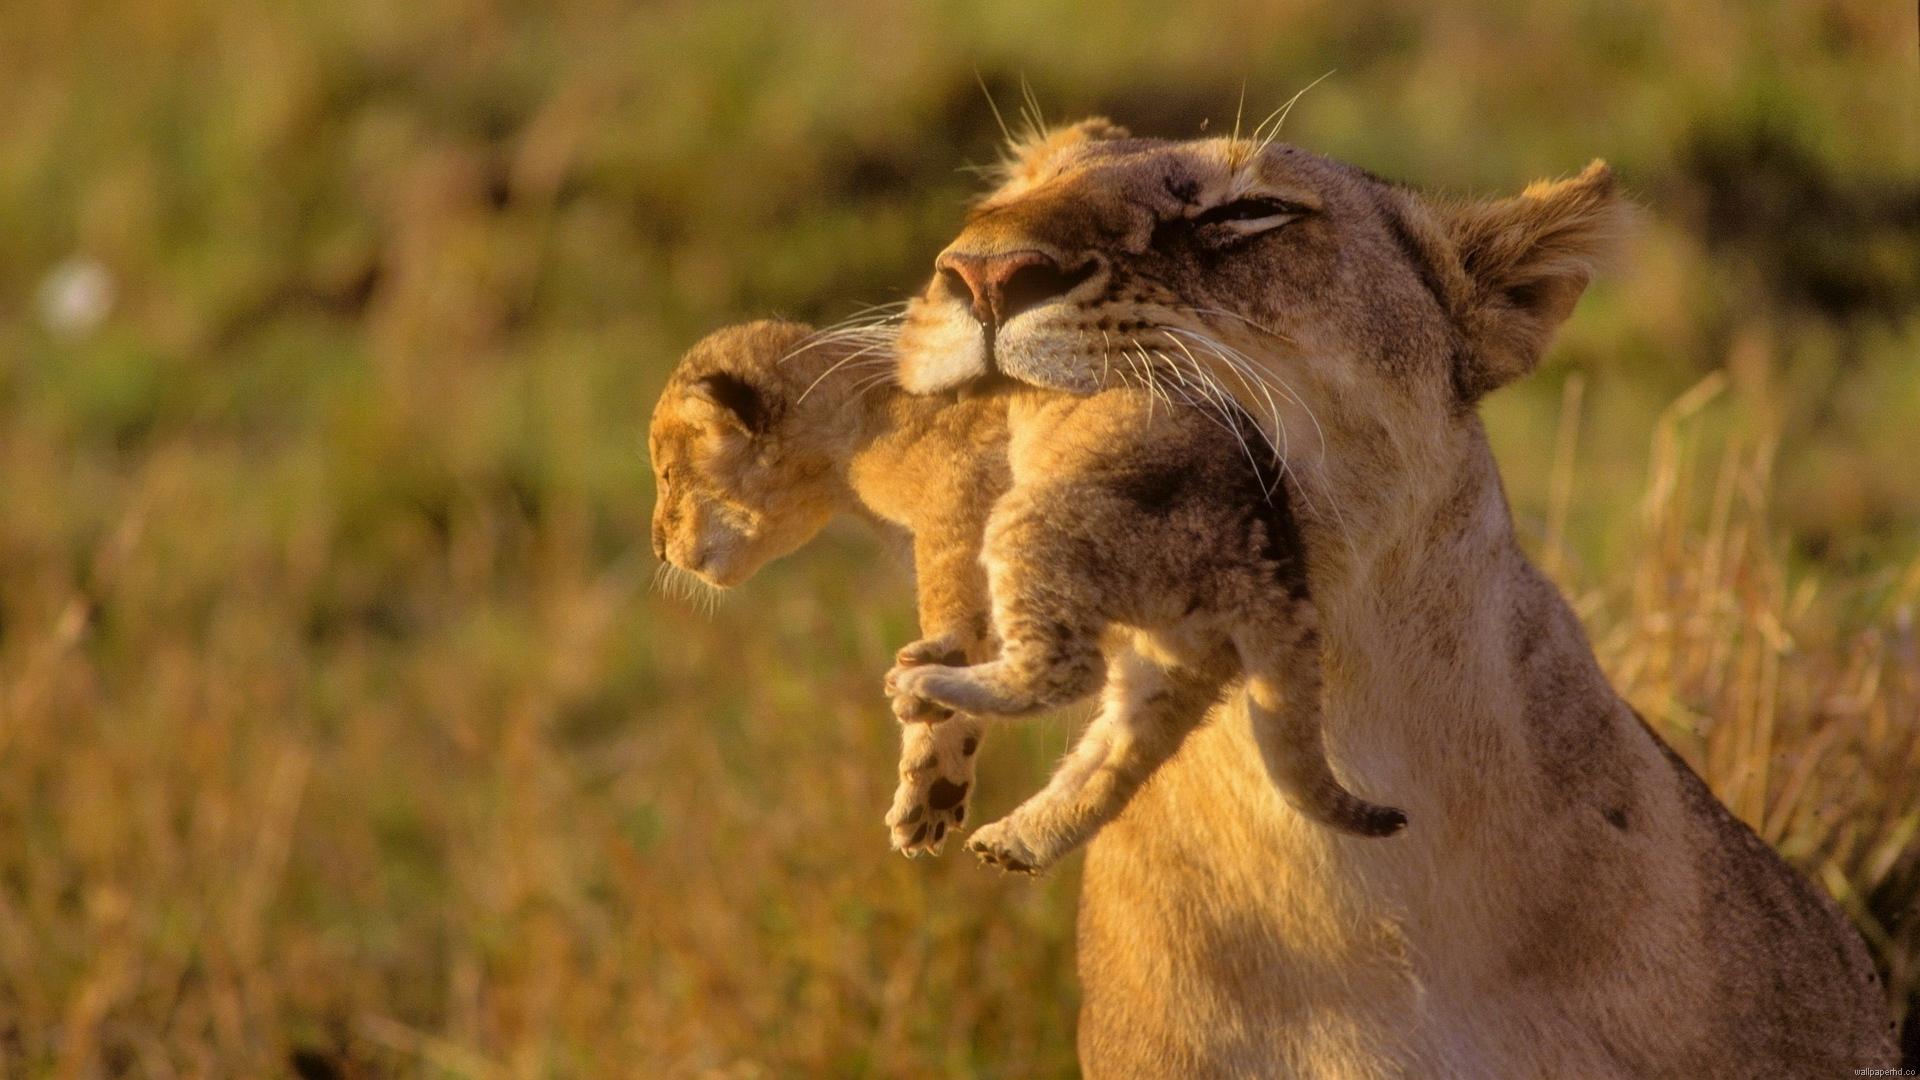 Wallpaper Cheetah Pair Hd Animals 6057: HD Animal Wallpapers 1080p